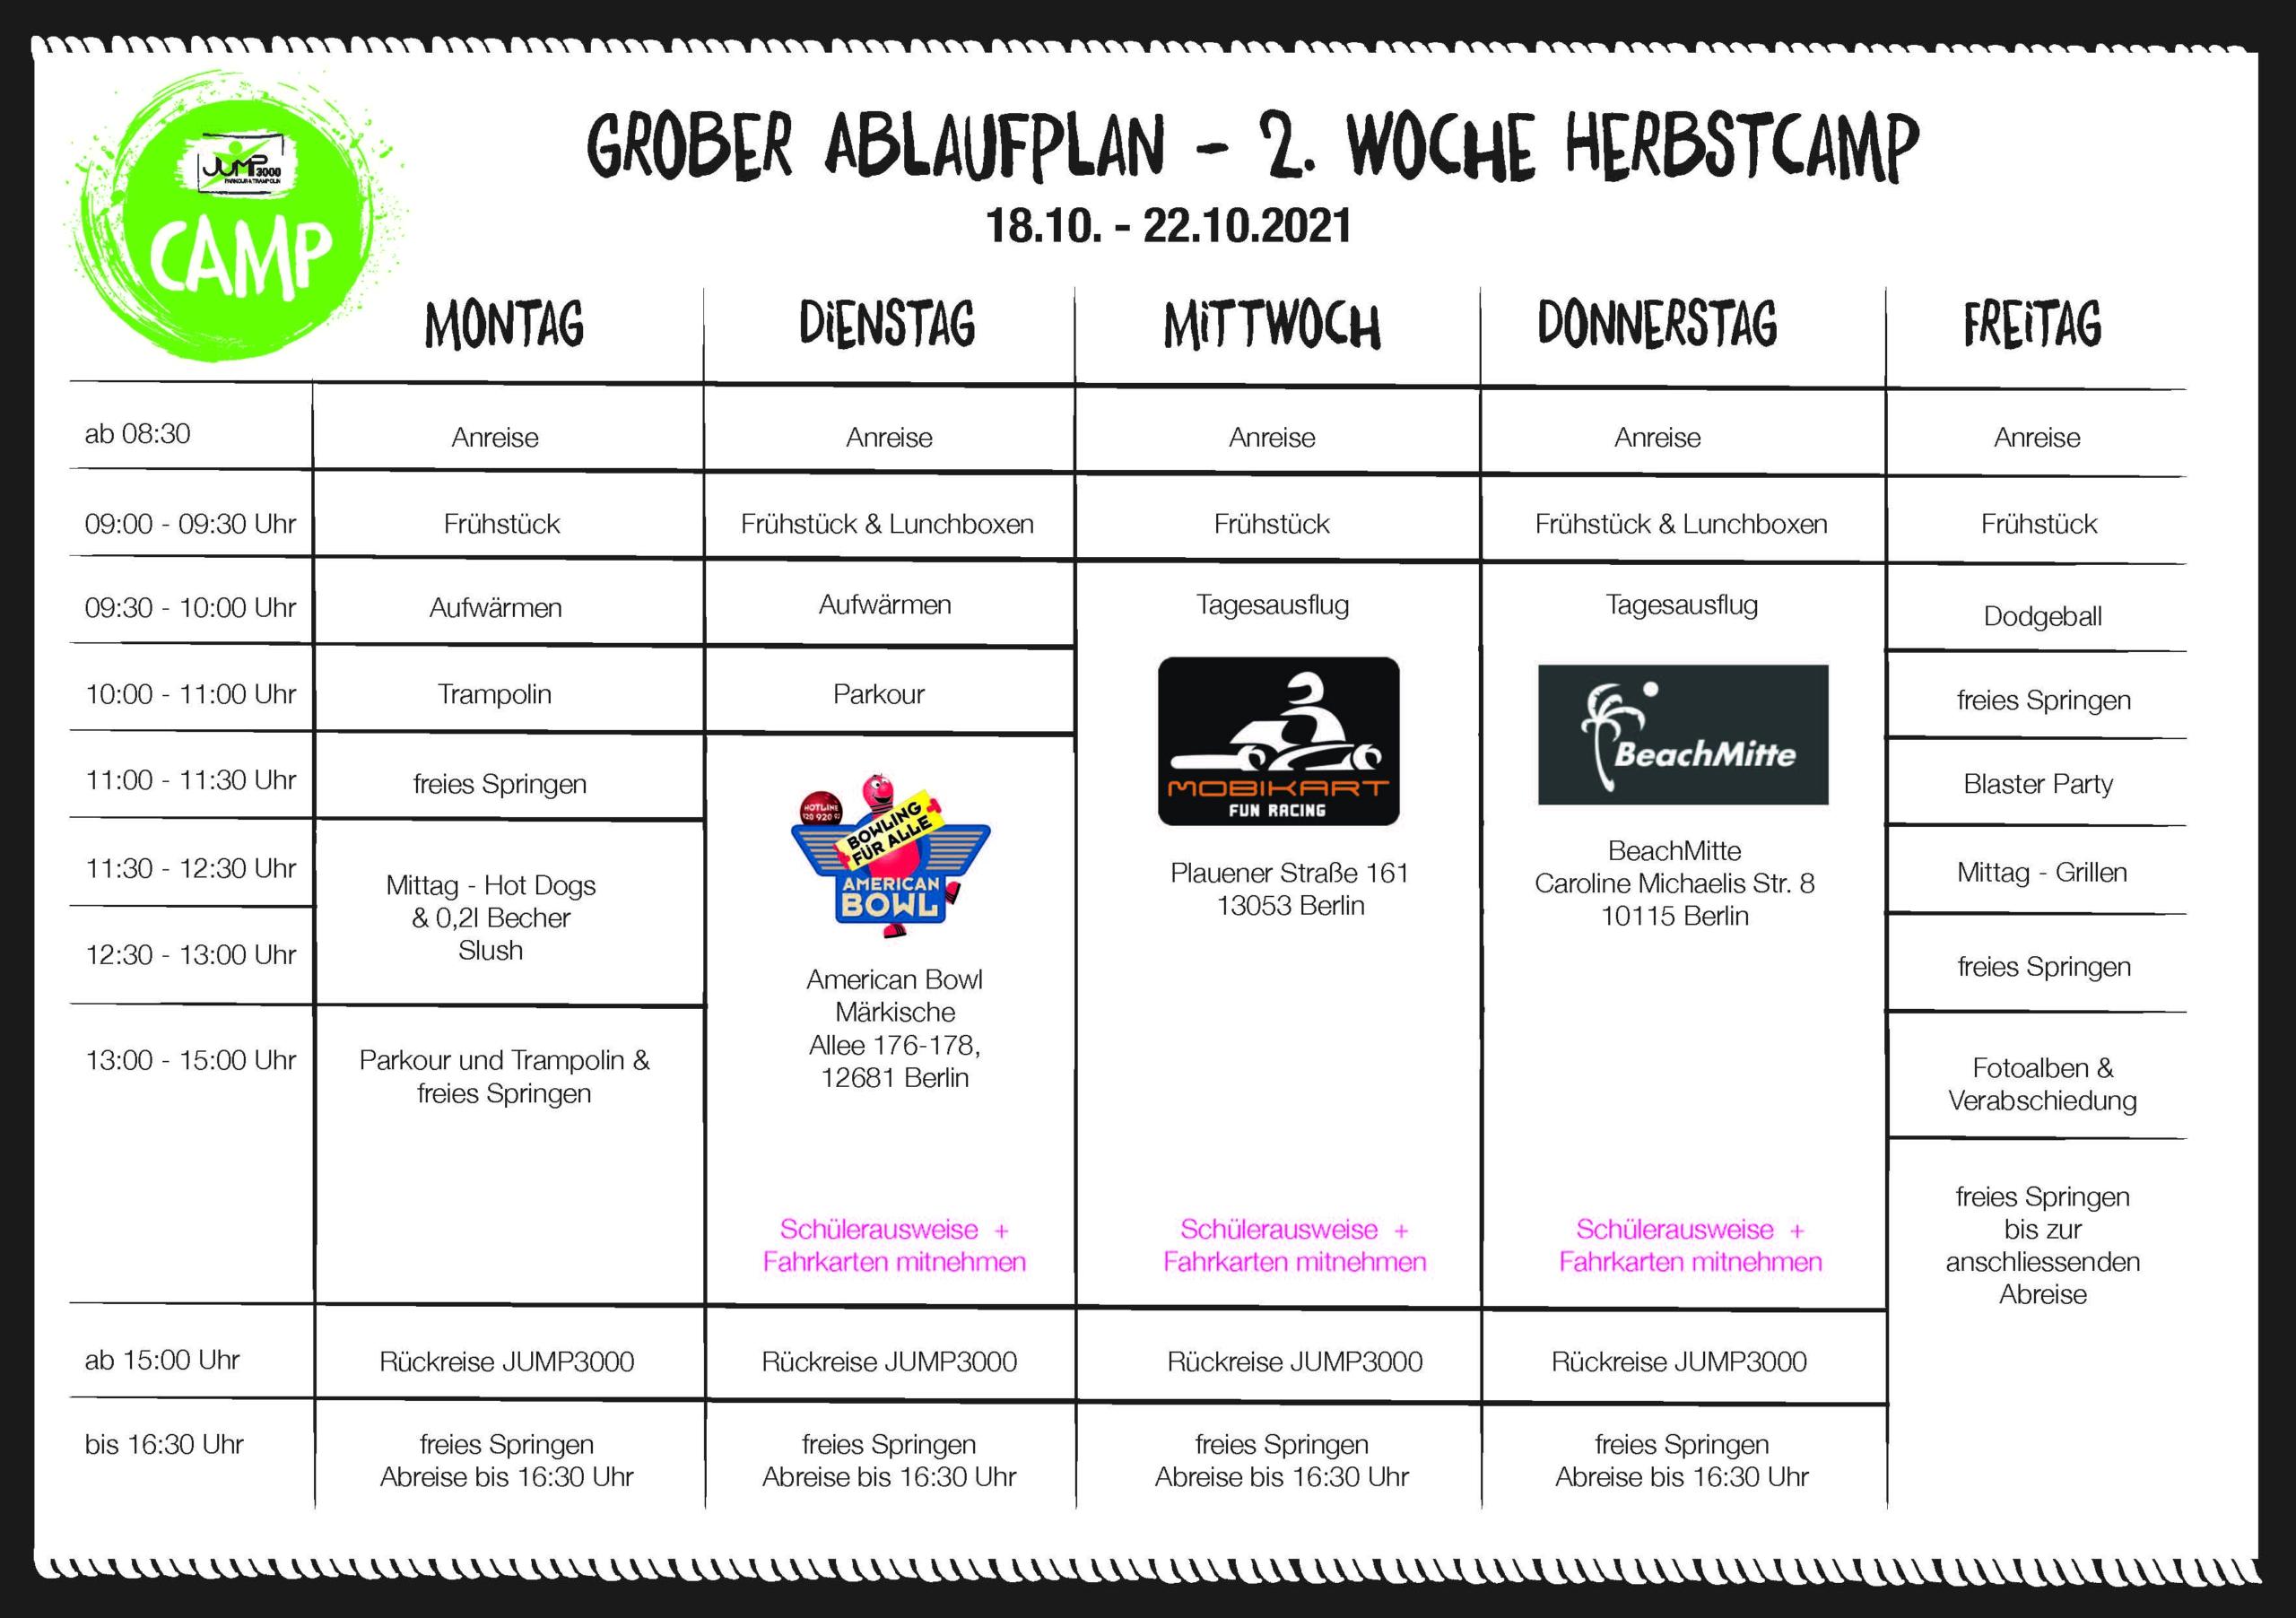 2. Woche Herbstcamp Ablaufplan